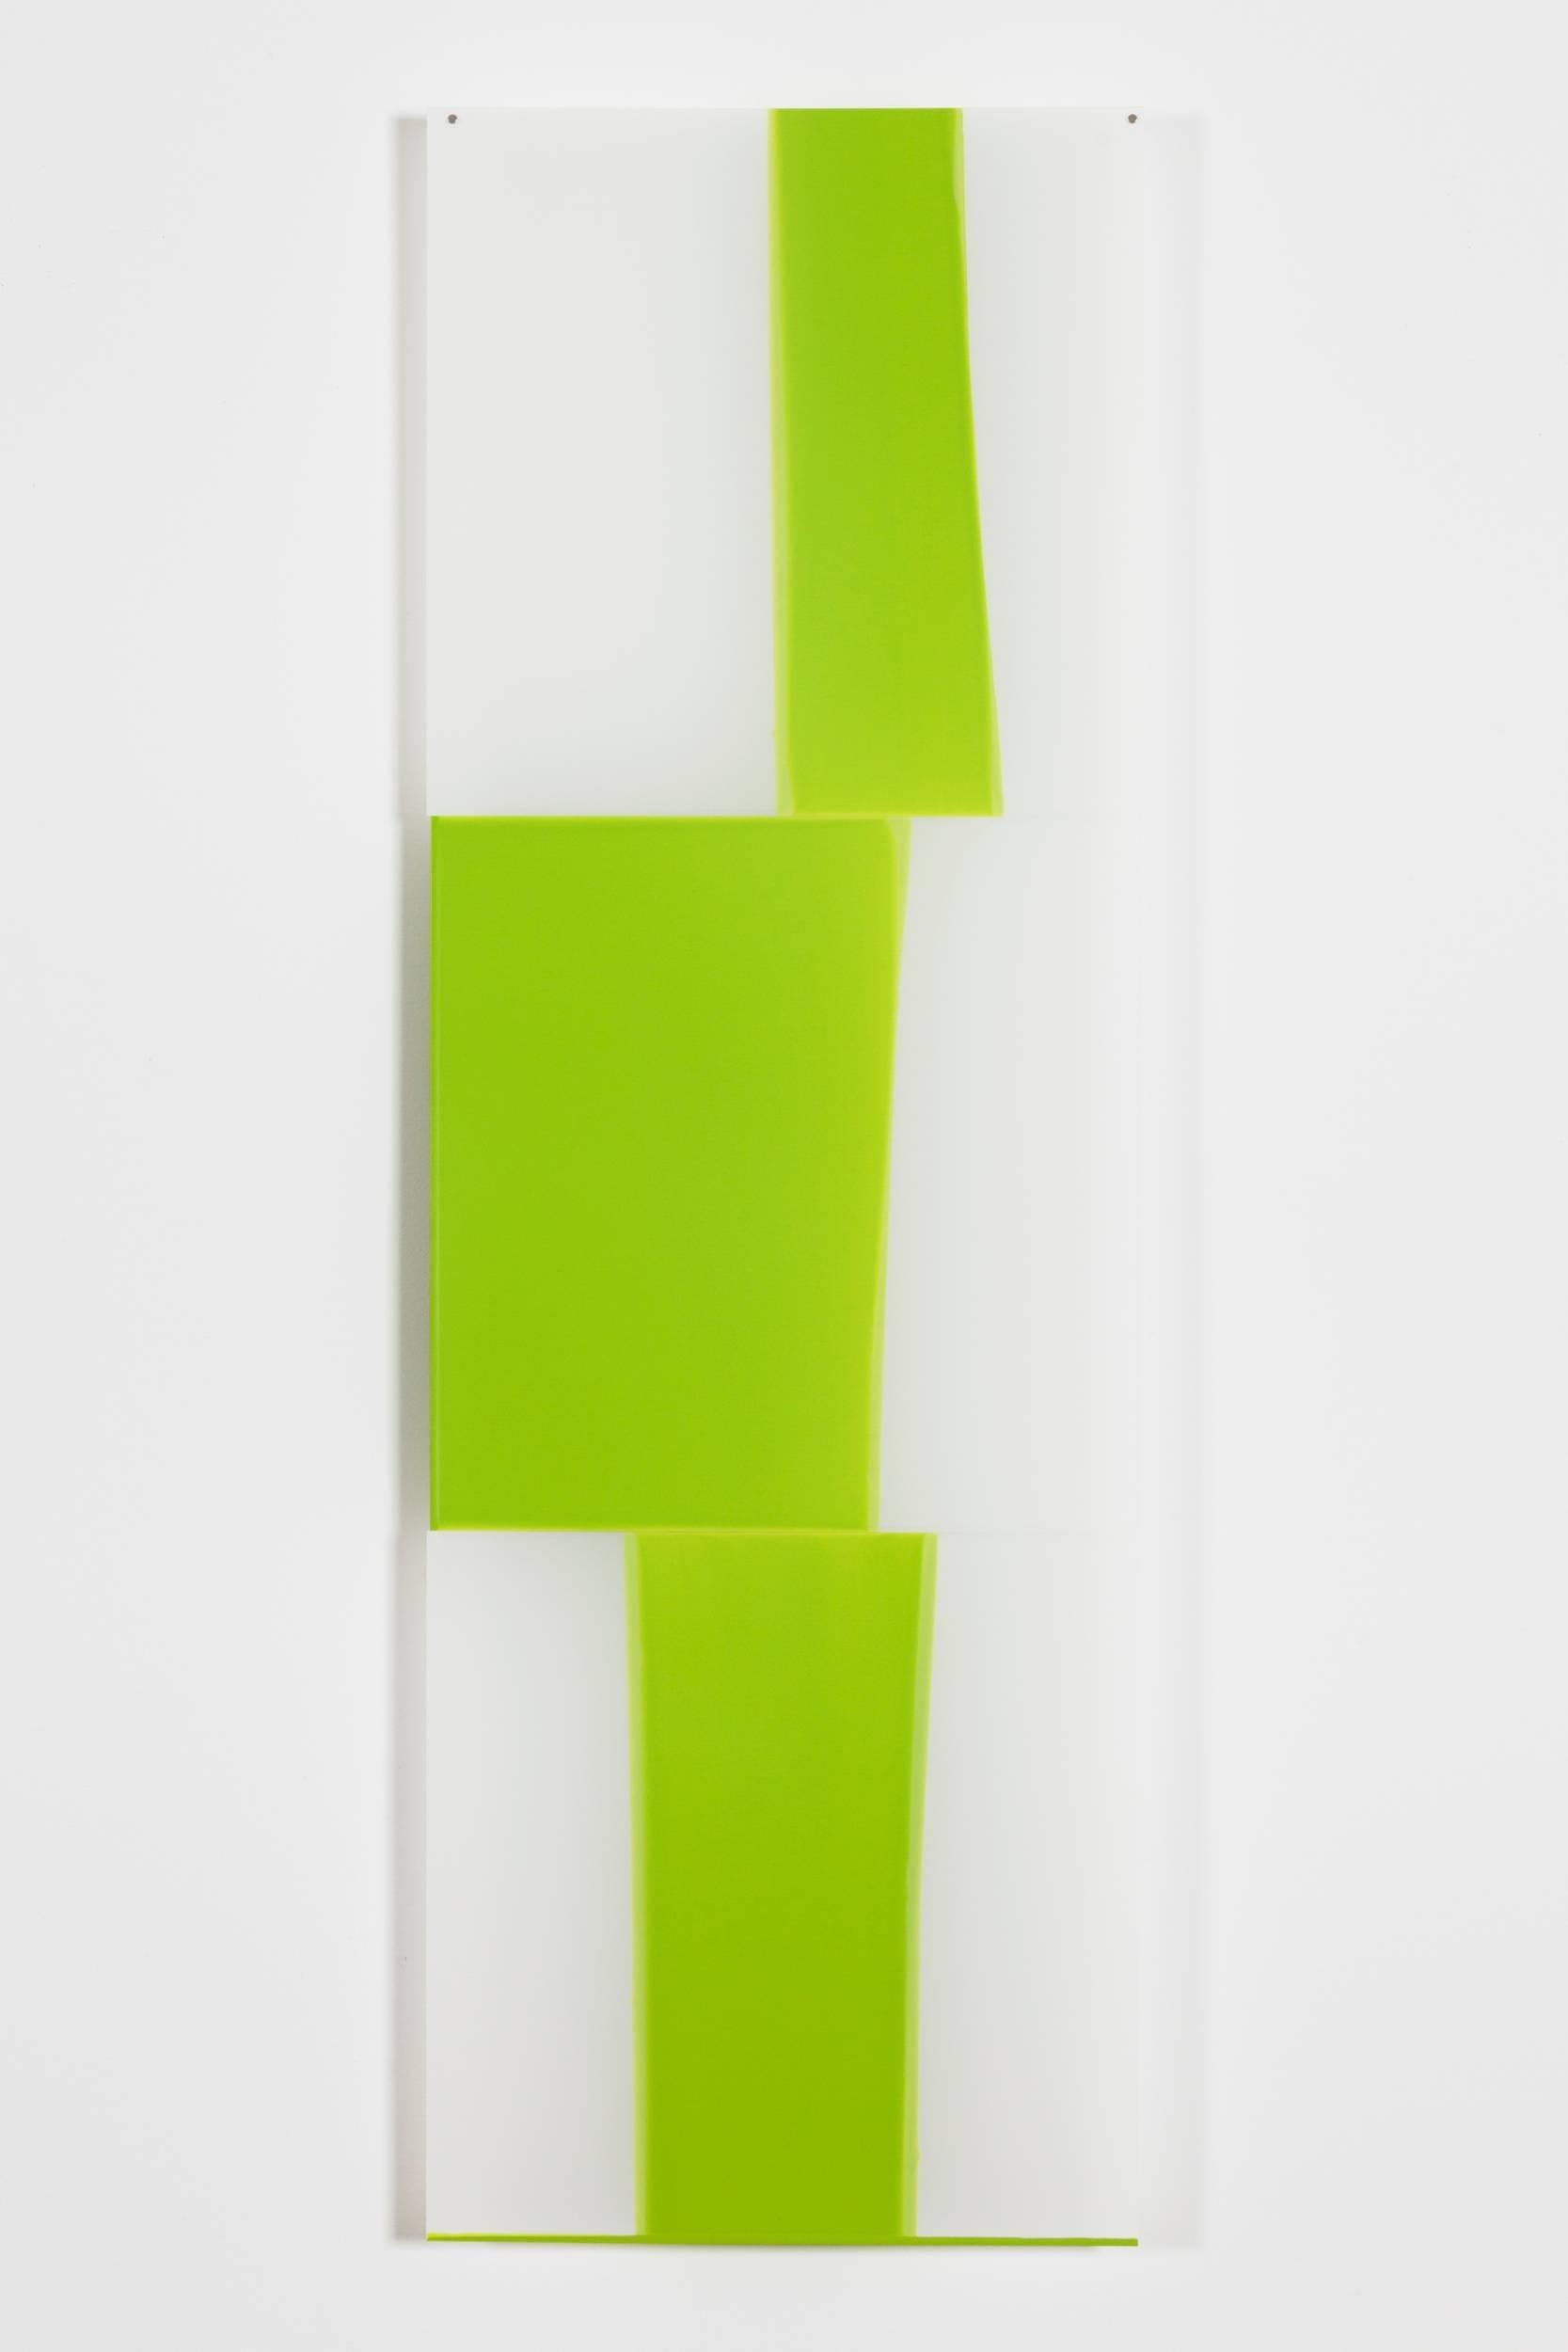 Mary Schiliro, Random Dip 7, acrylic paint on mylar, 36 x 12 in, Abstraction